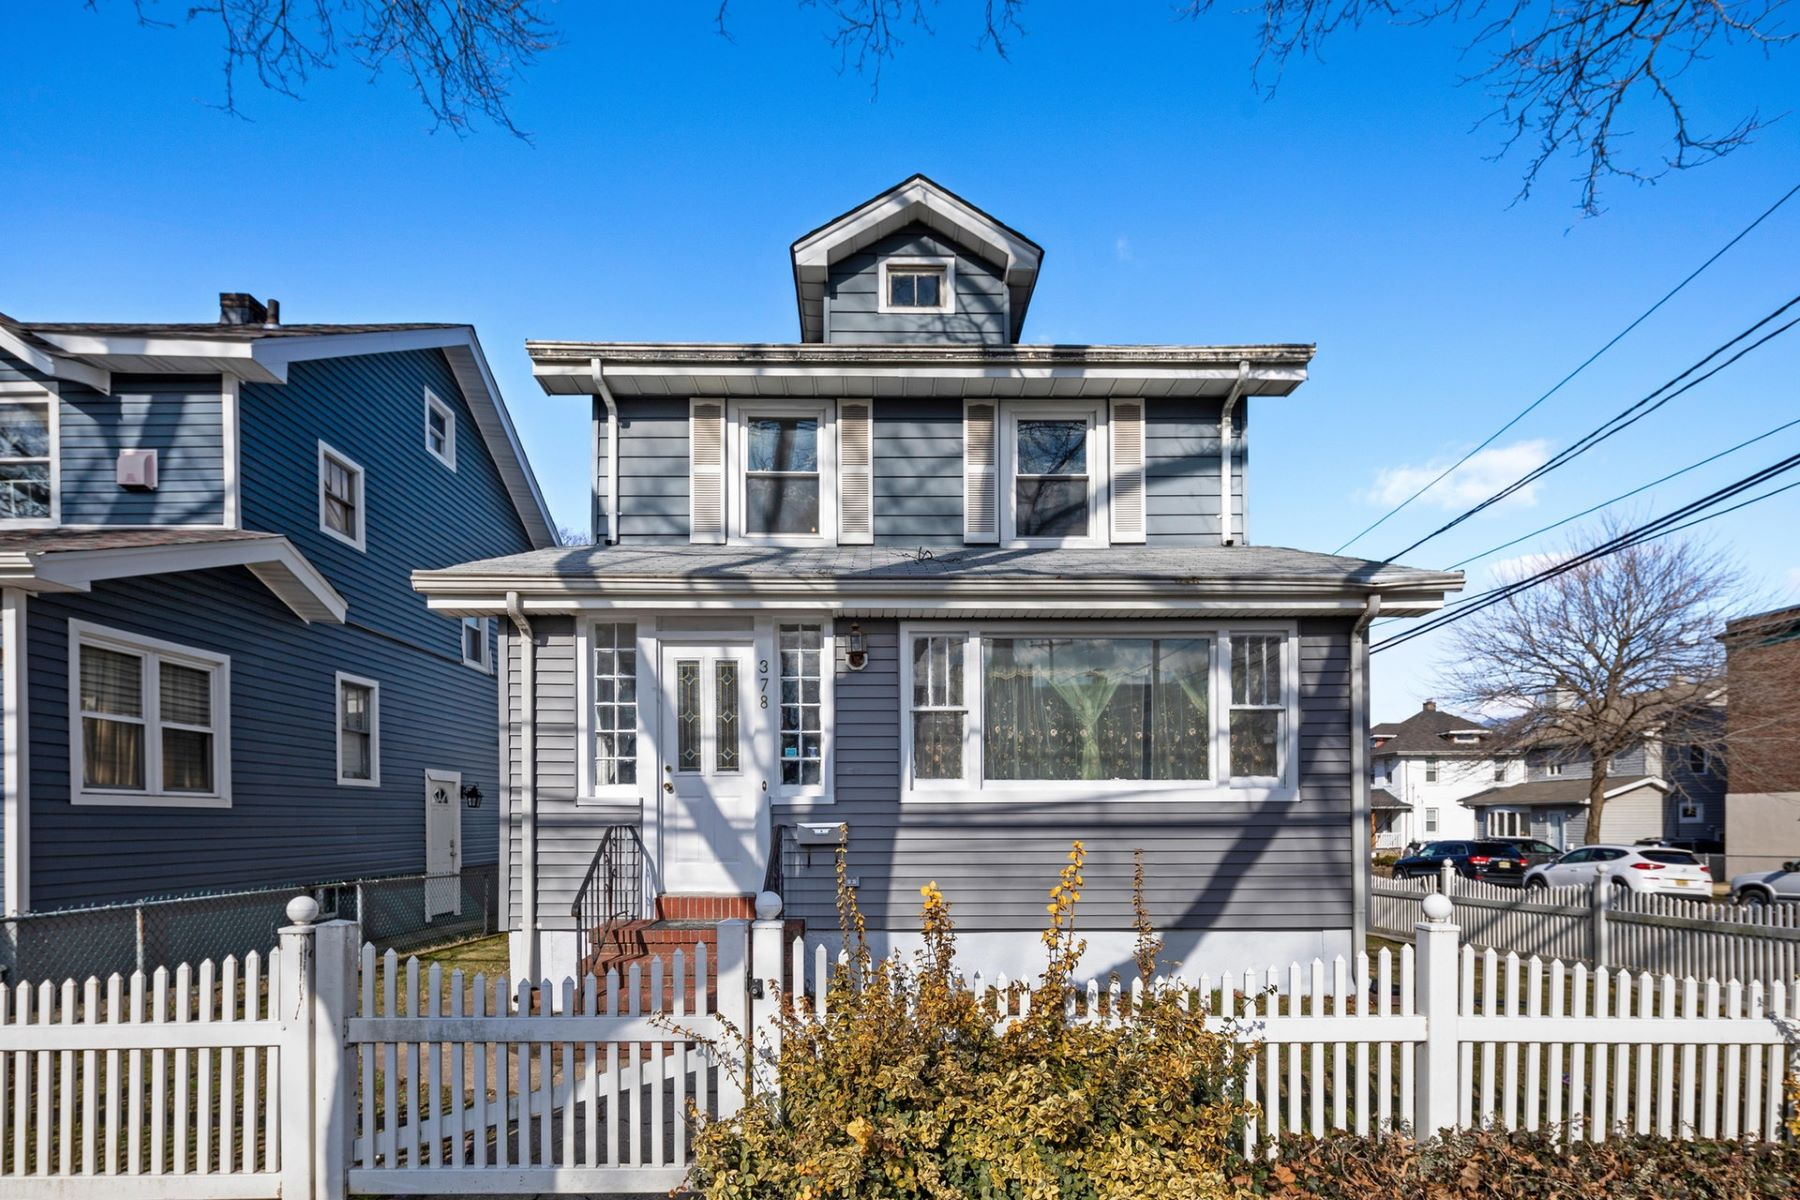 Single Family Homes pour l Vente à Welcome Home! 378 Palisade Ave, Bogota, New Jersey 07603 États-Unis